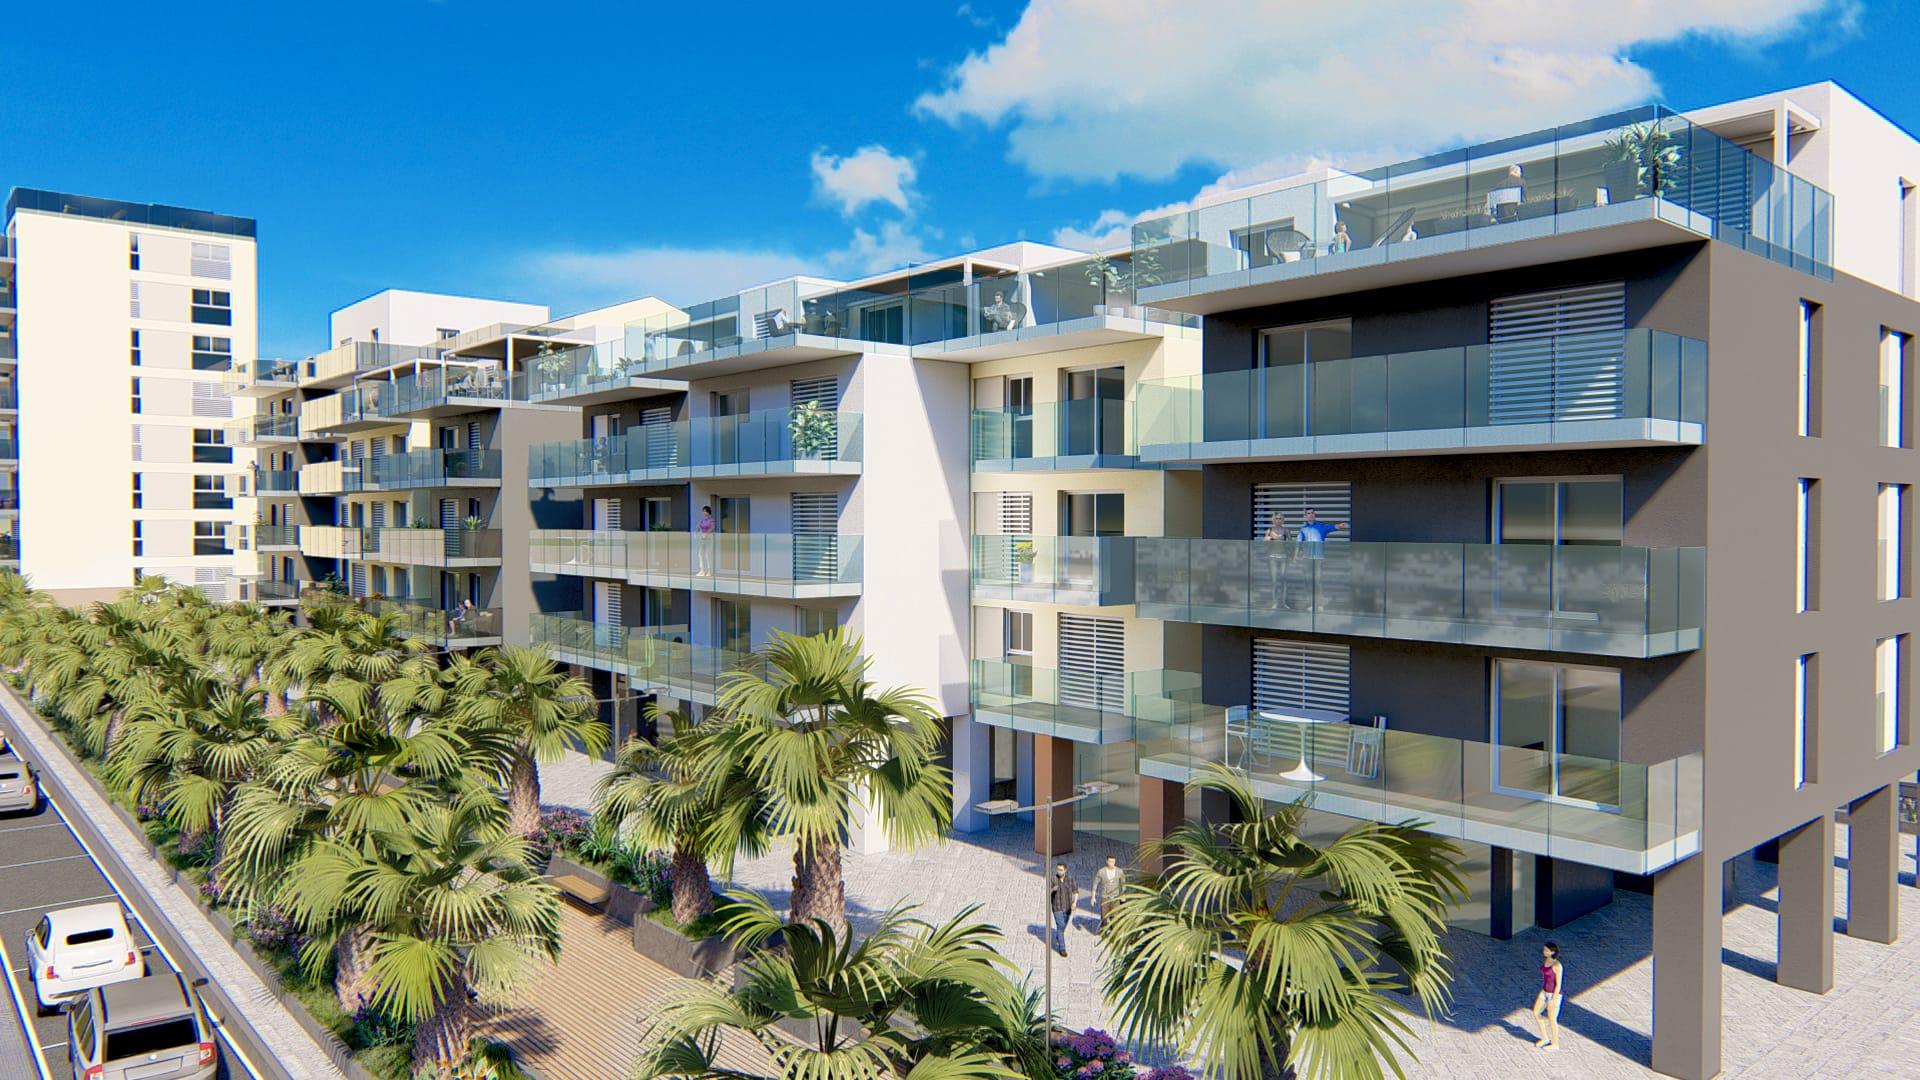 Riviera Varazze THE HOUSING ESTATE